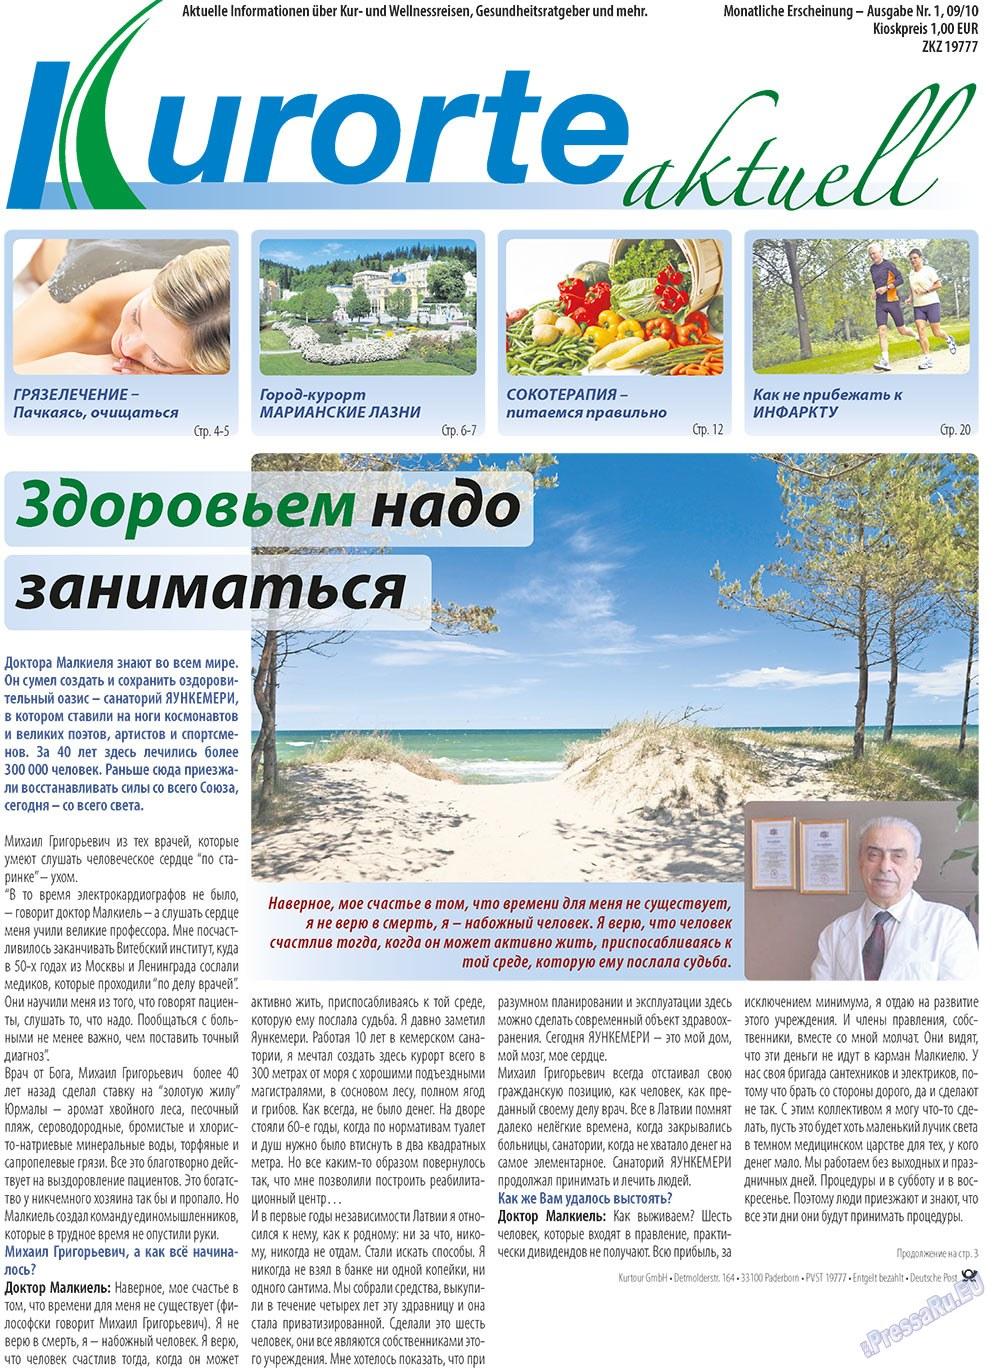 Kurorte aktuell (газета). 2010 год, номер 1, стр. 1